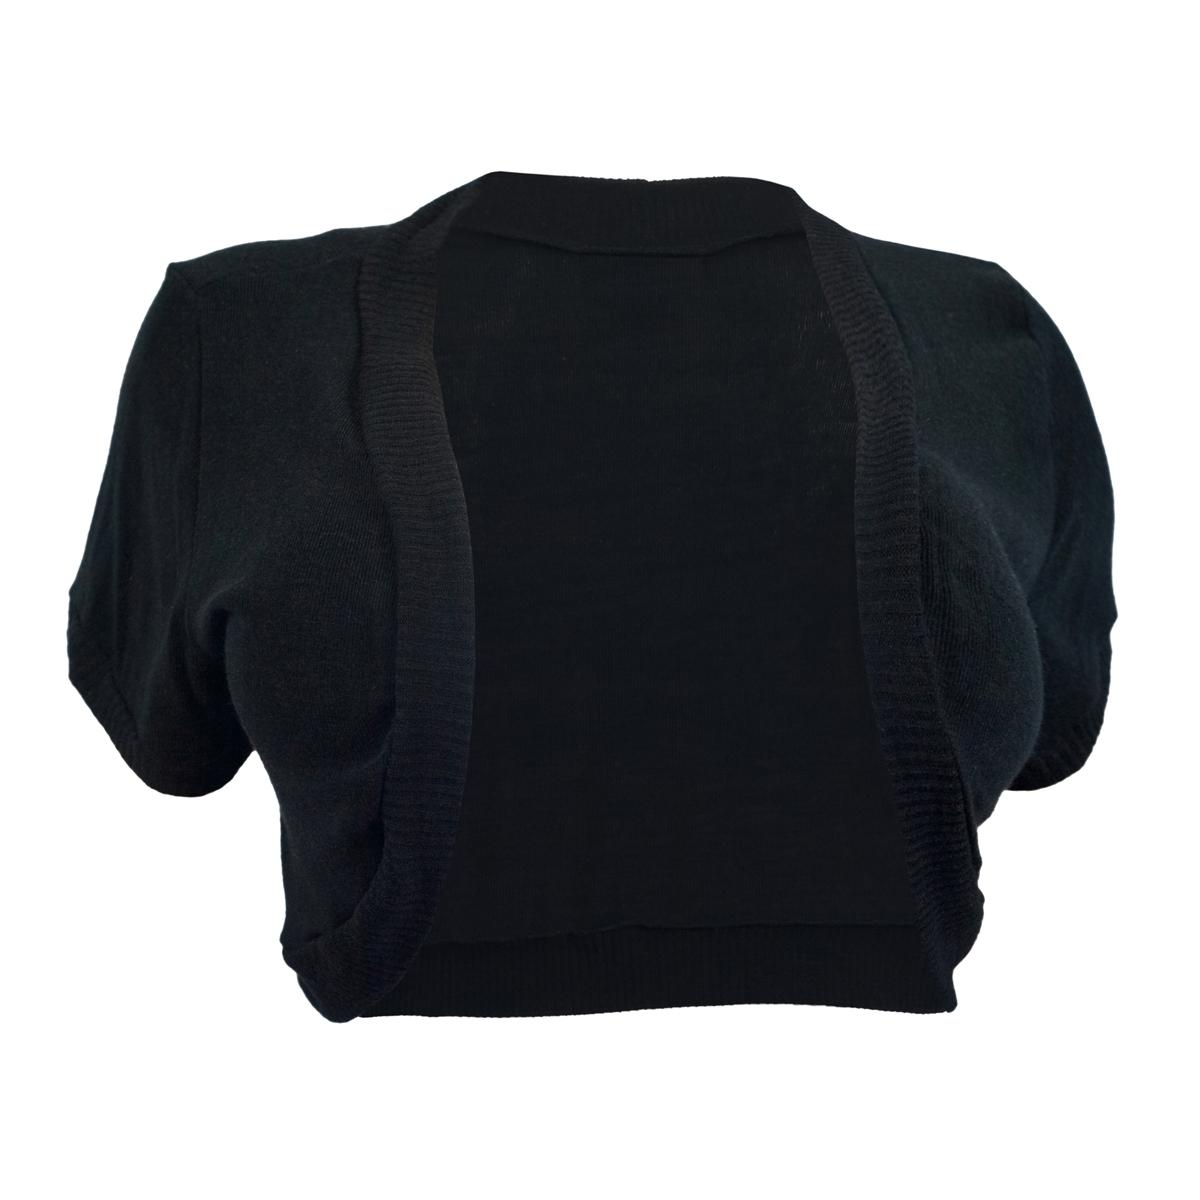 Womens' Open Front Cropped Bolero Shrug Black